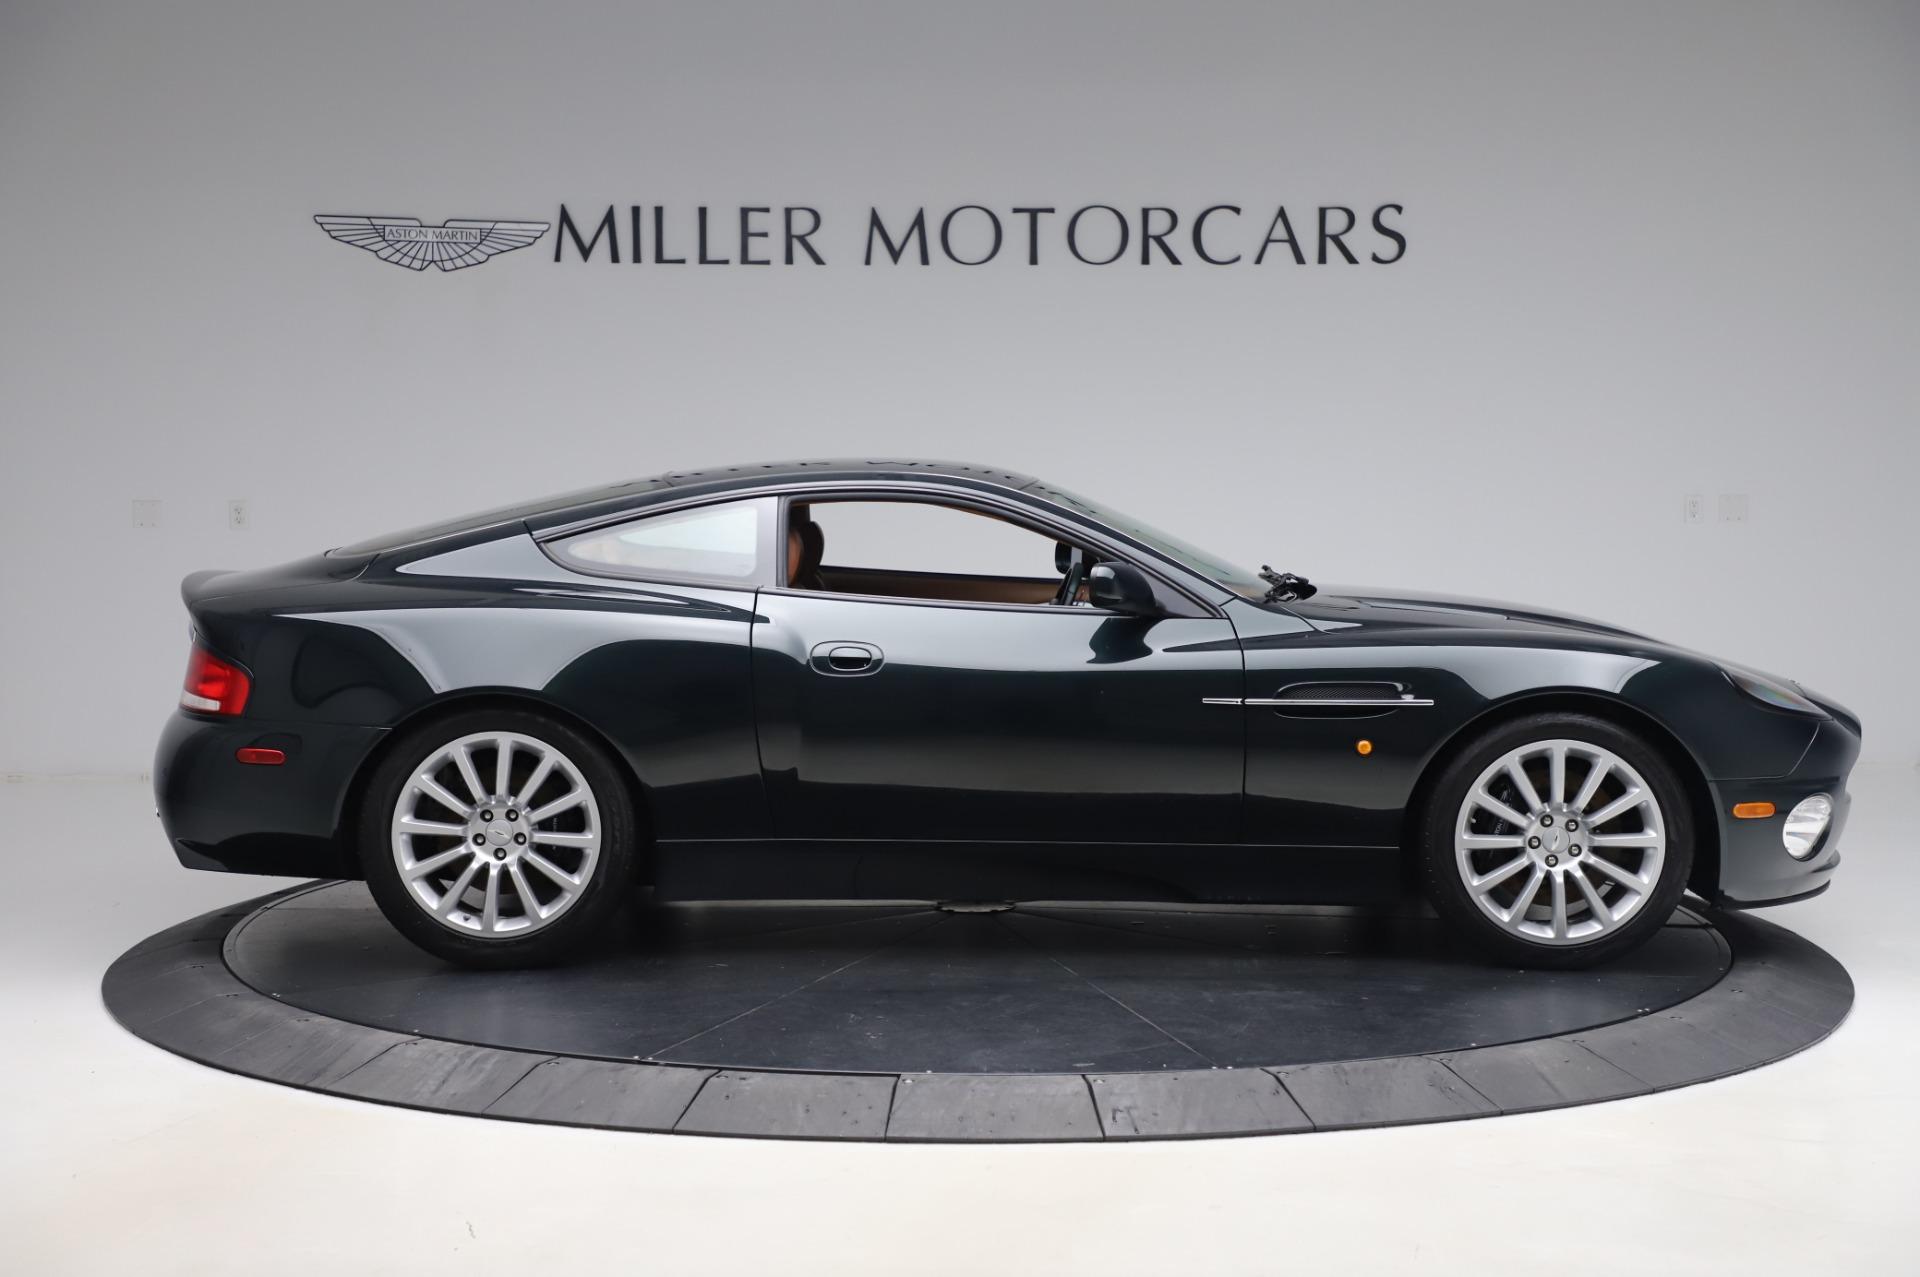 Used 2003 Aston Martin V12 Vanquish Coupe